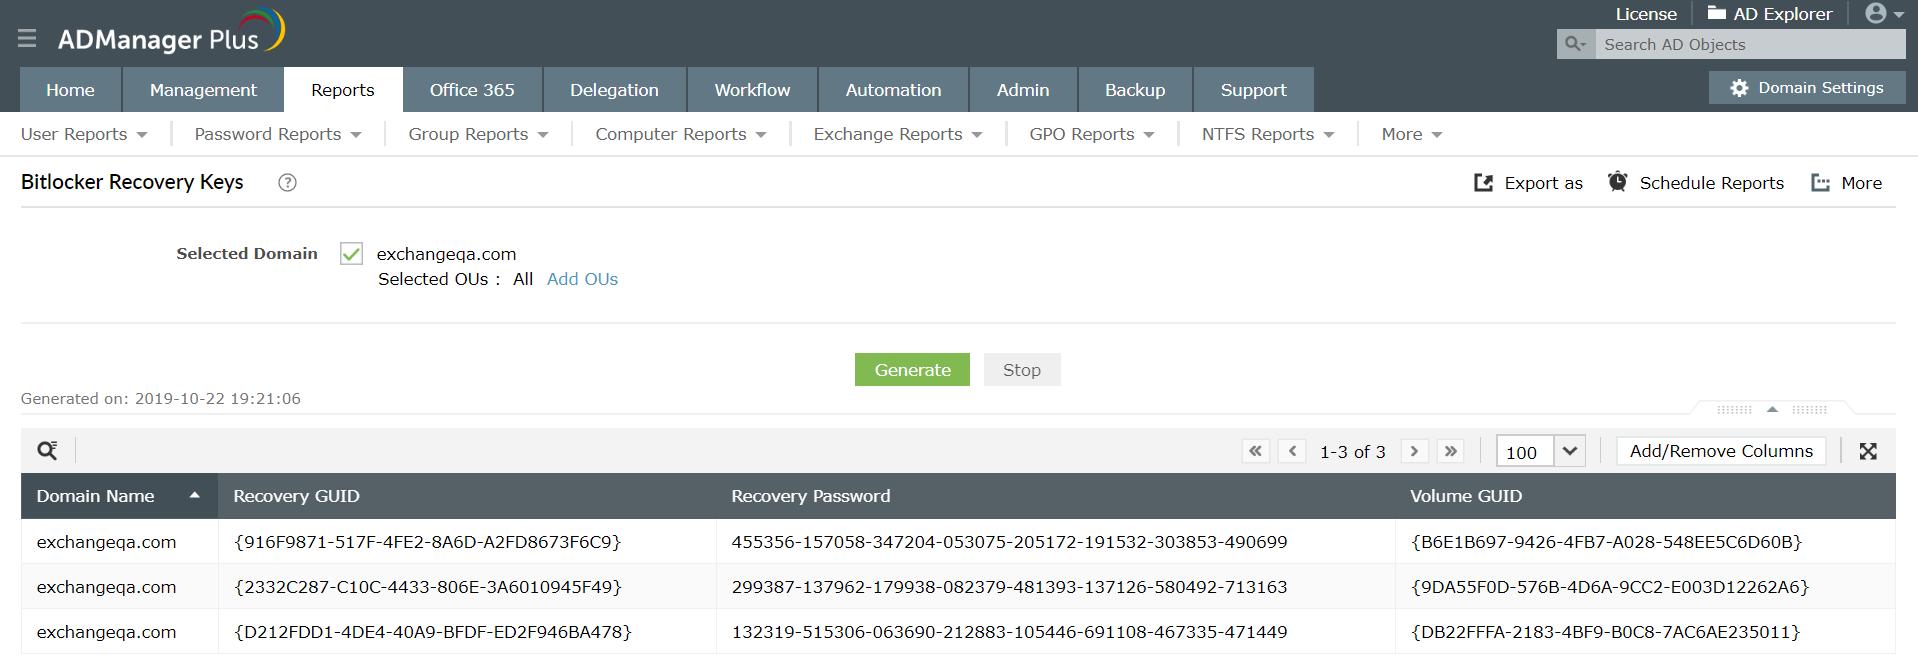 Get BitLocker recovery keys using ADManager Plus